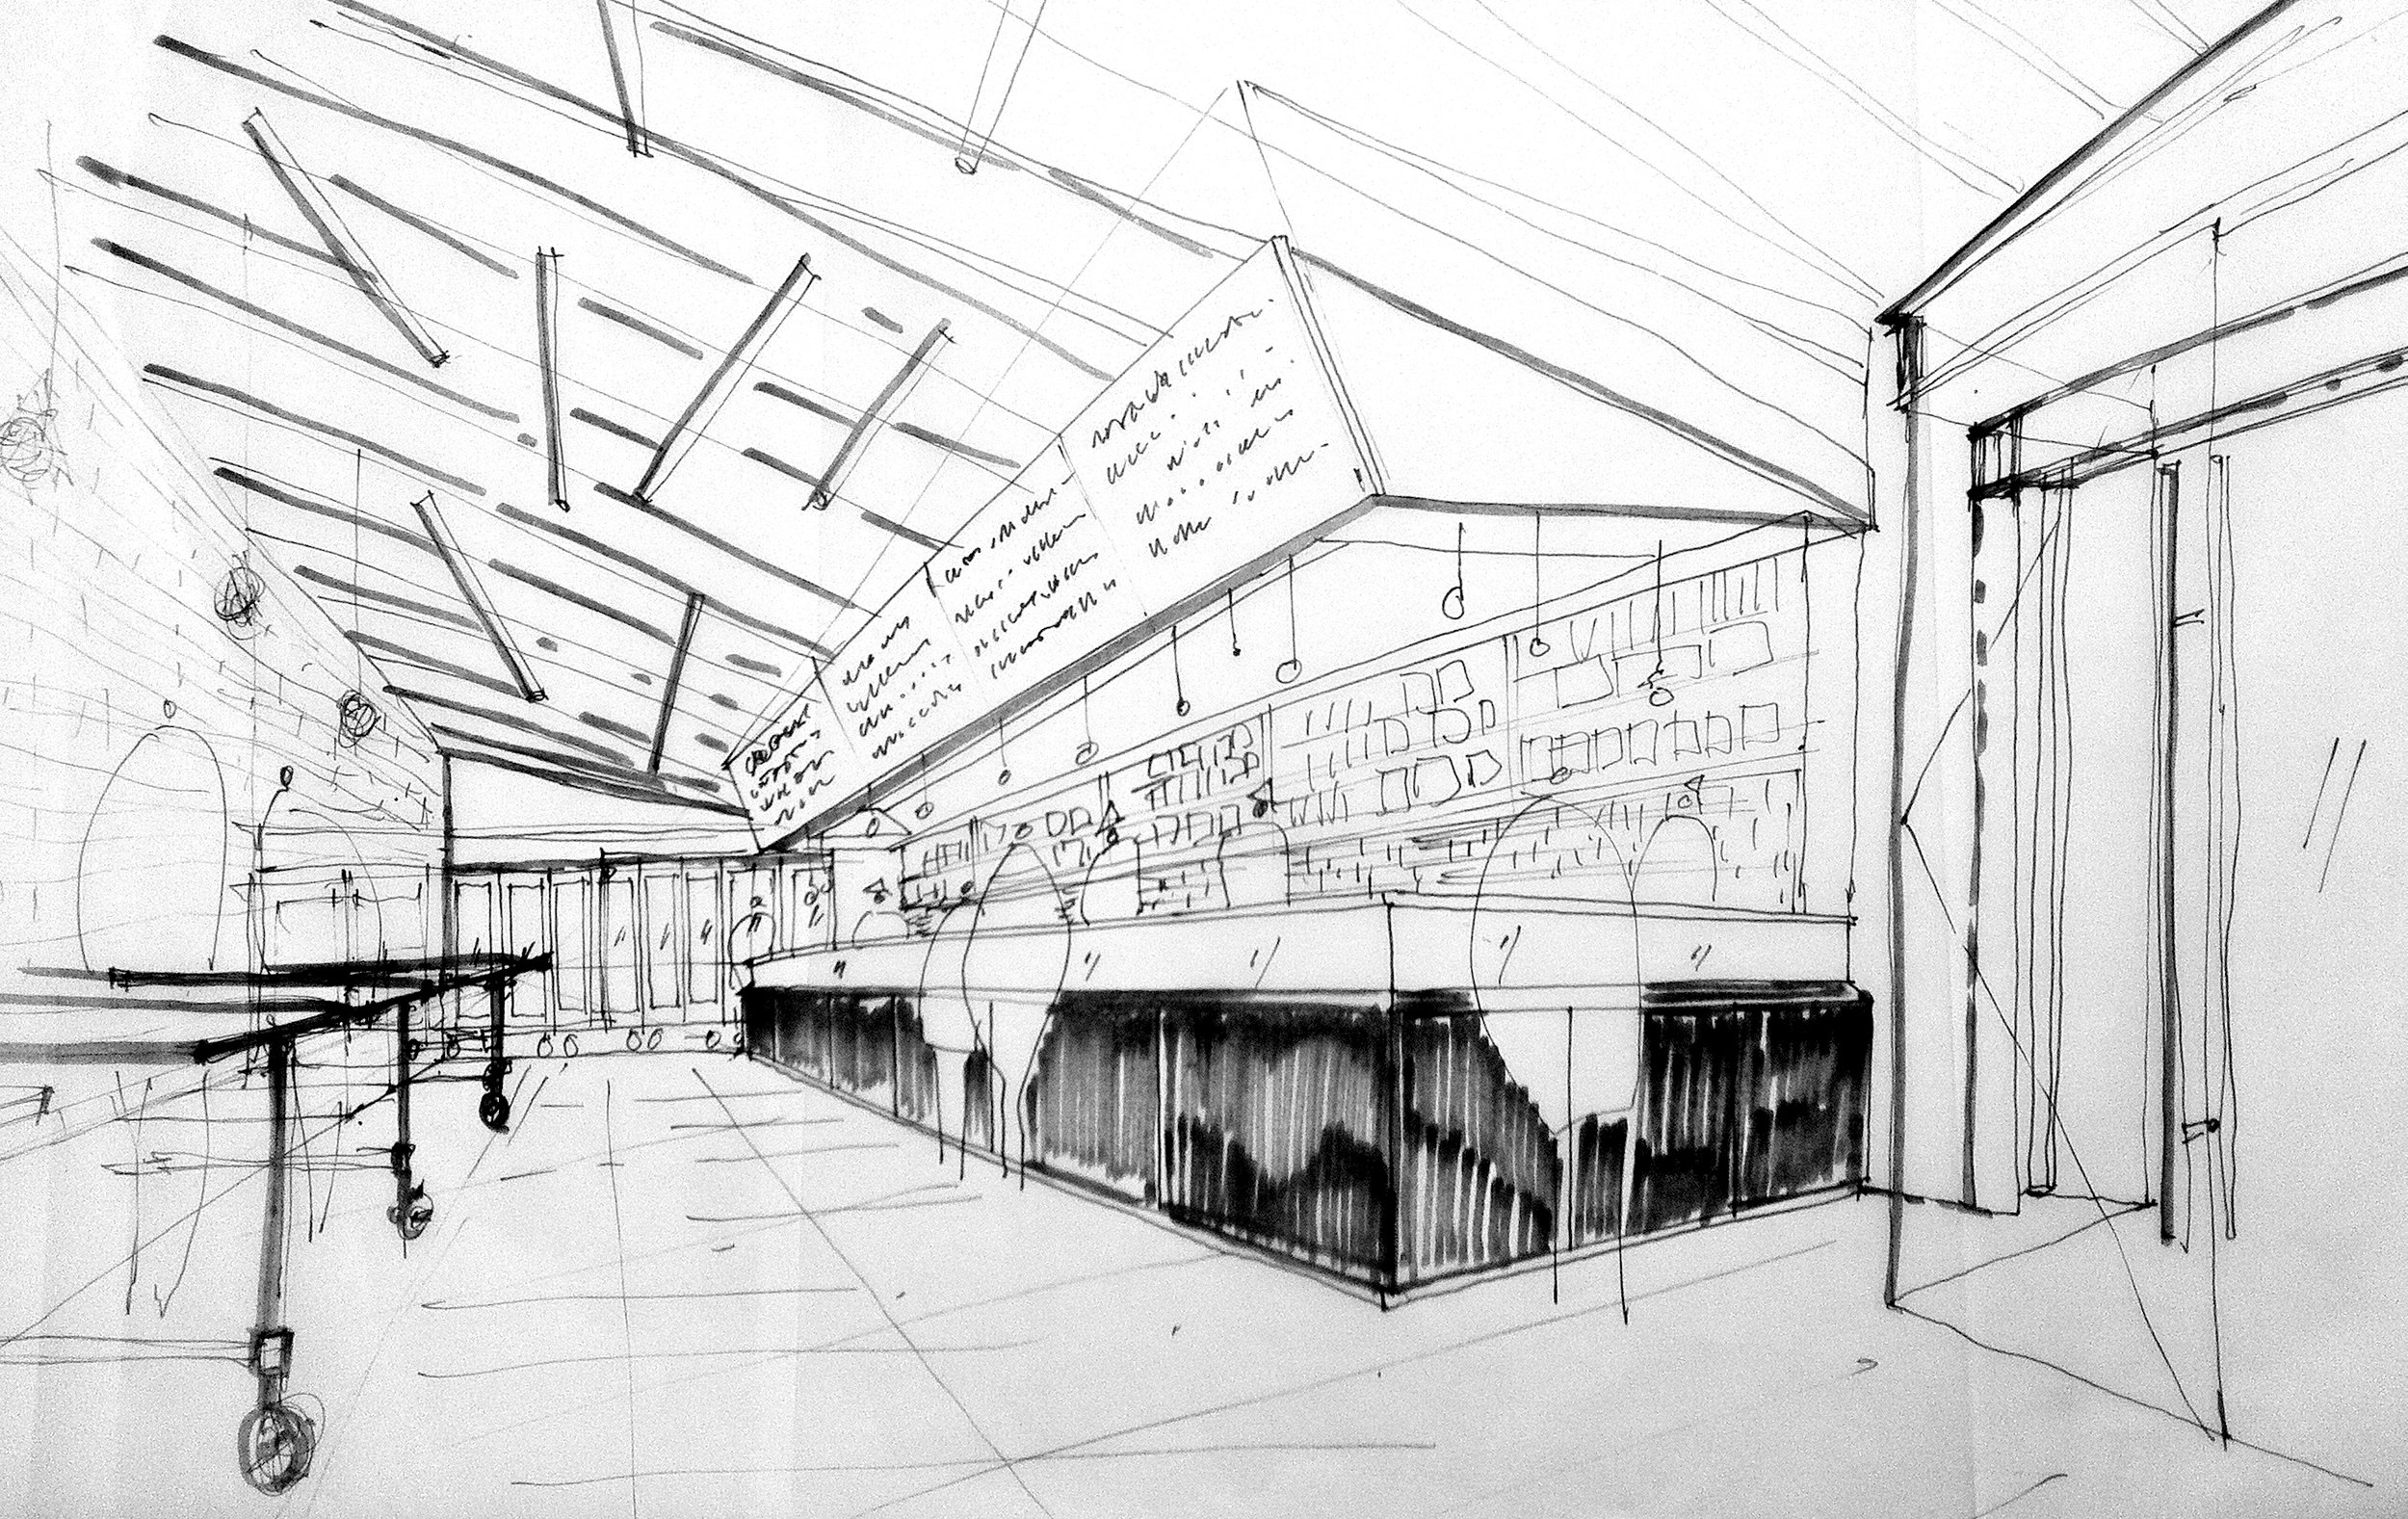 studio-saint-bars-and-restaurants-maketto-washington-dc-sketch-2